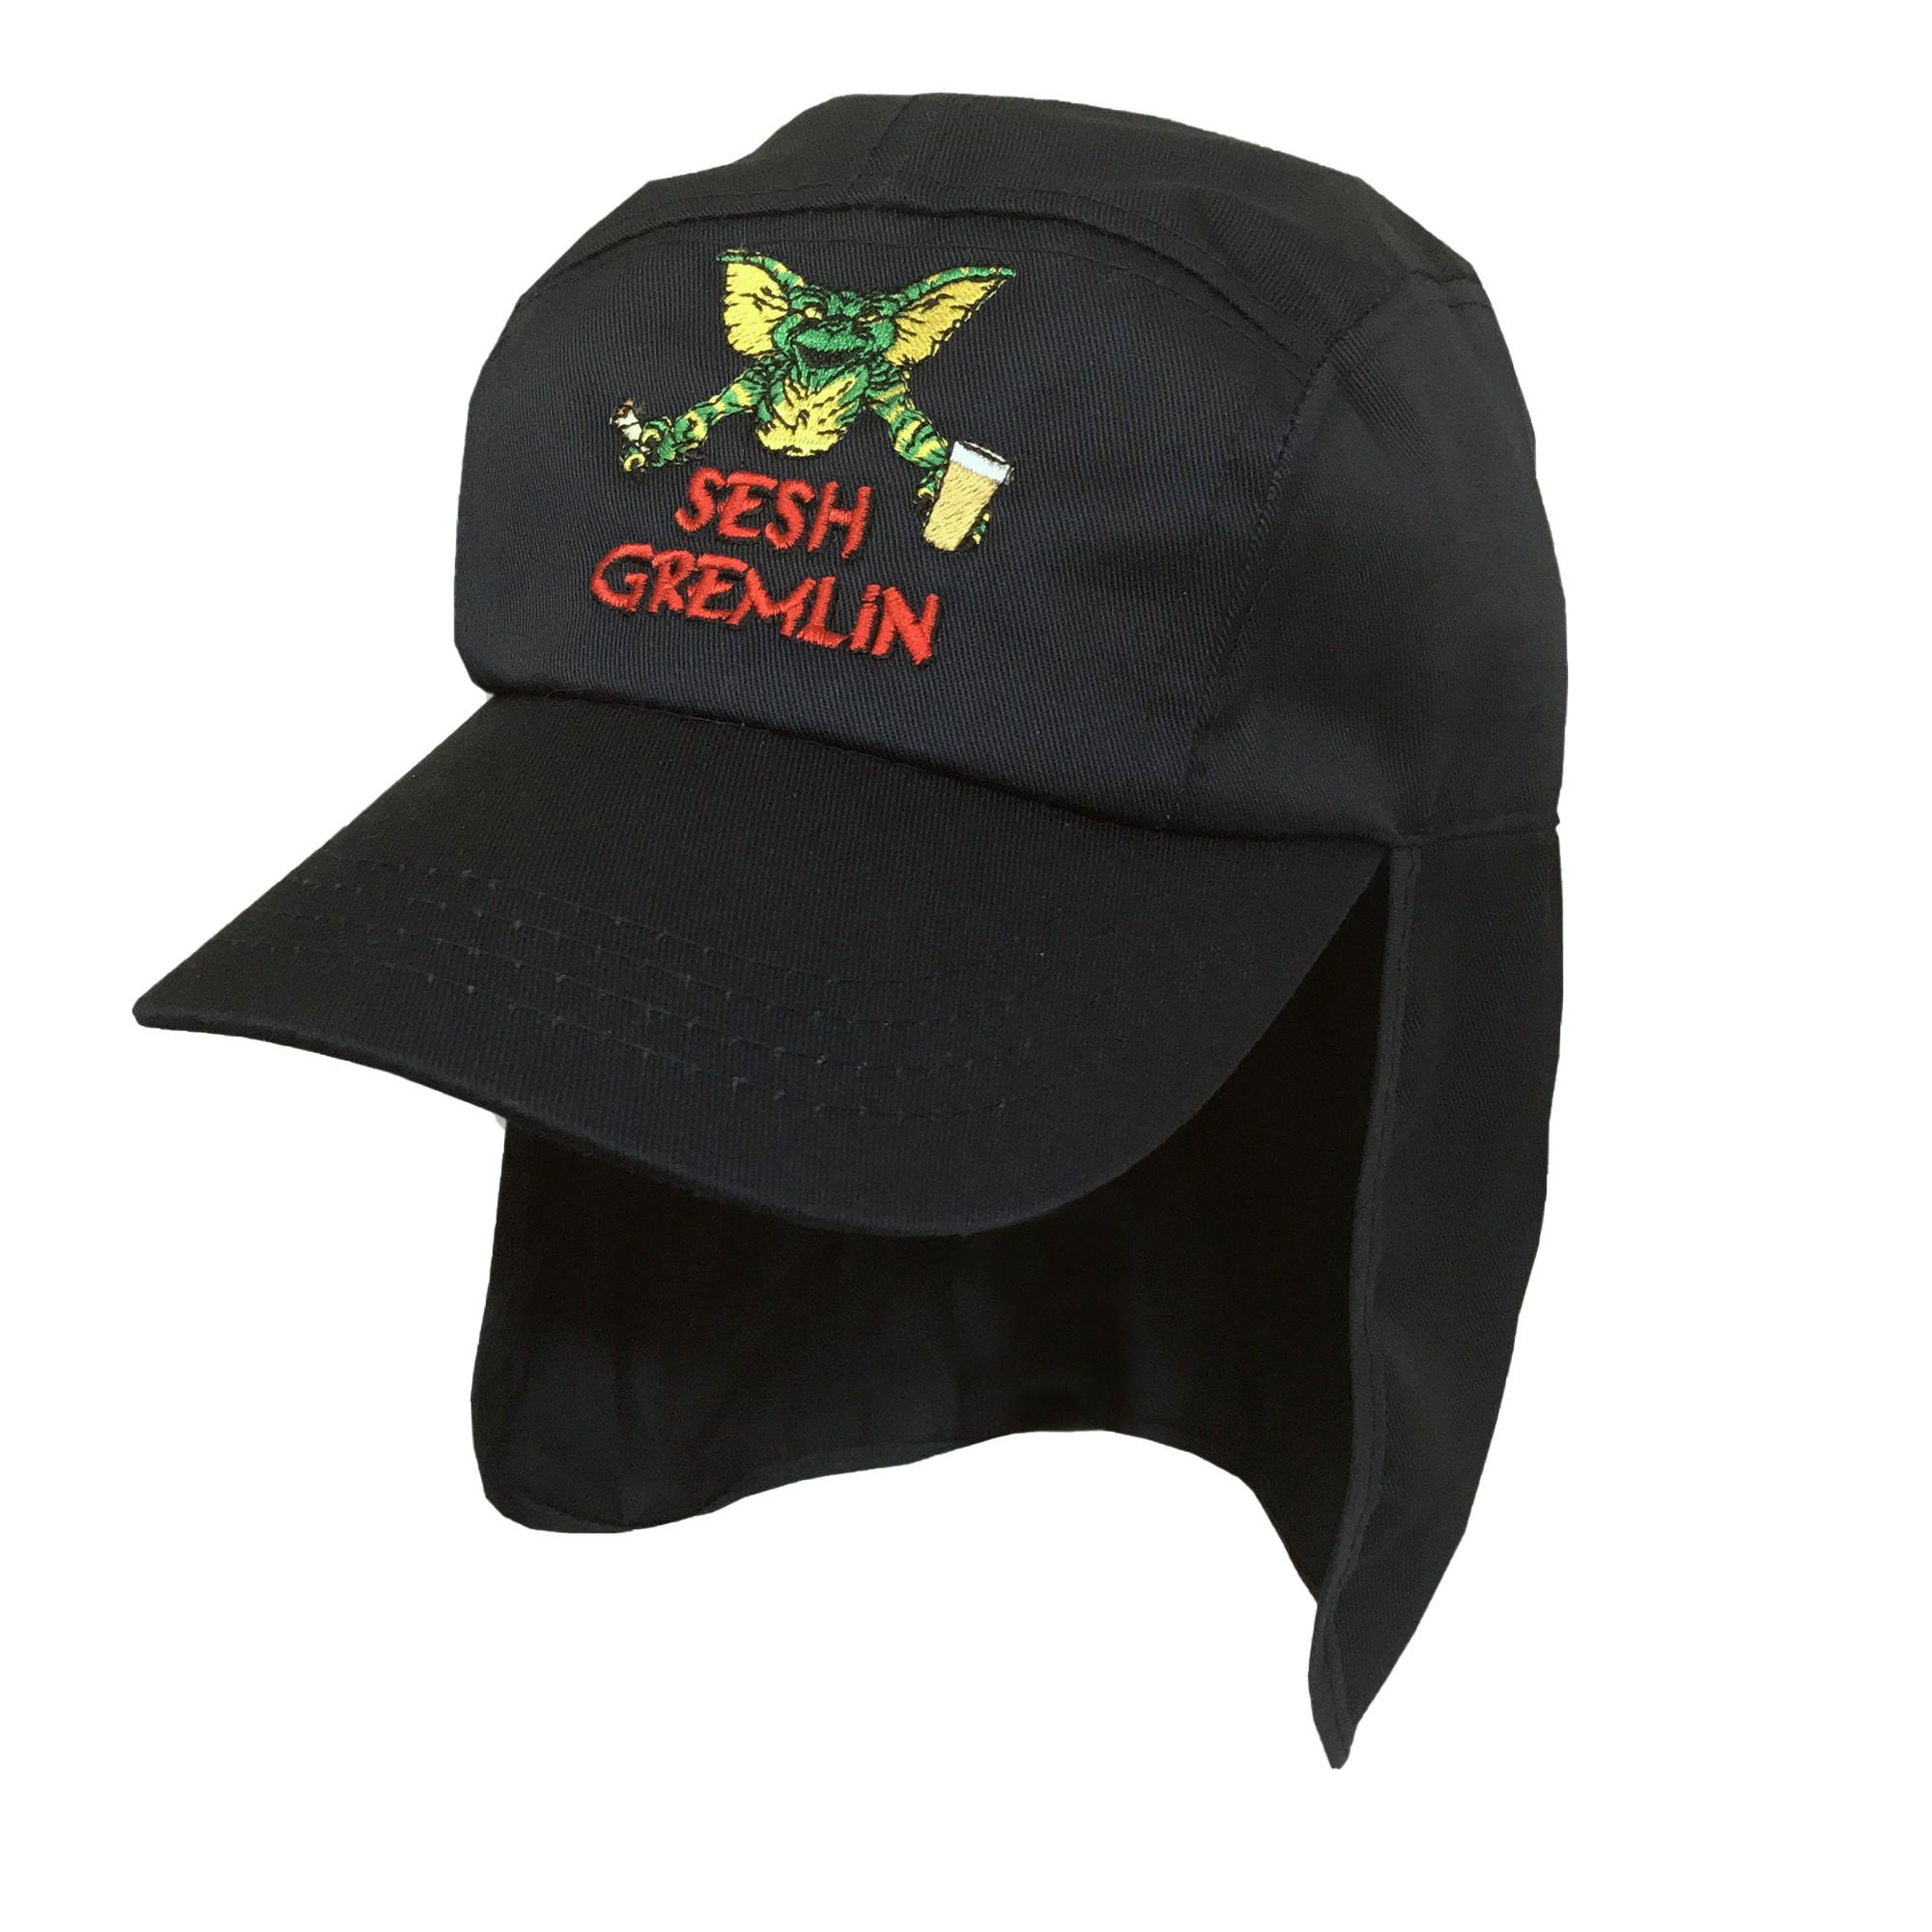 SESH GREMLIN BLACK LEGIONNAIRES HAT